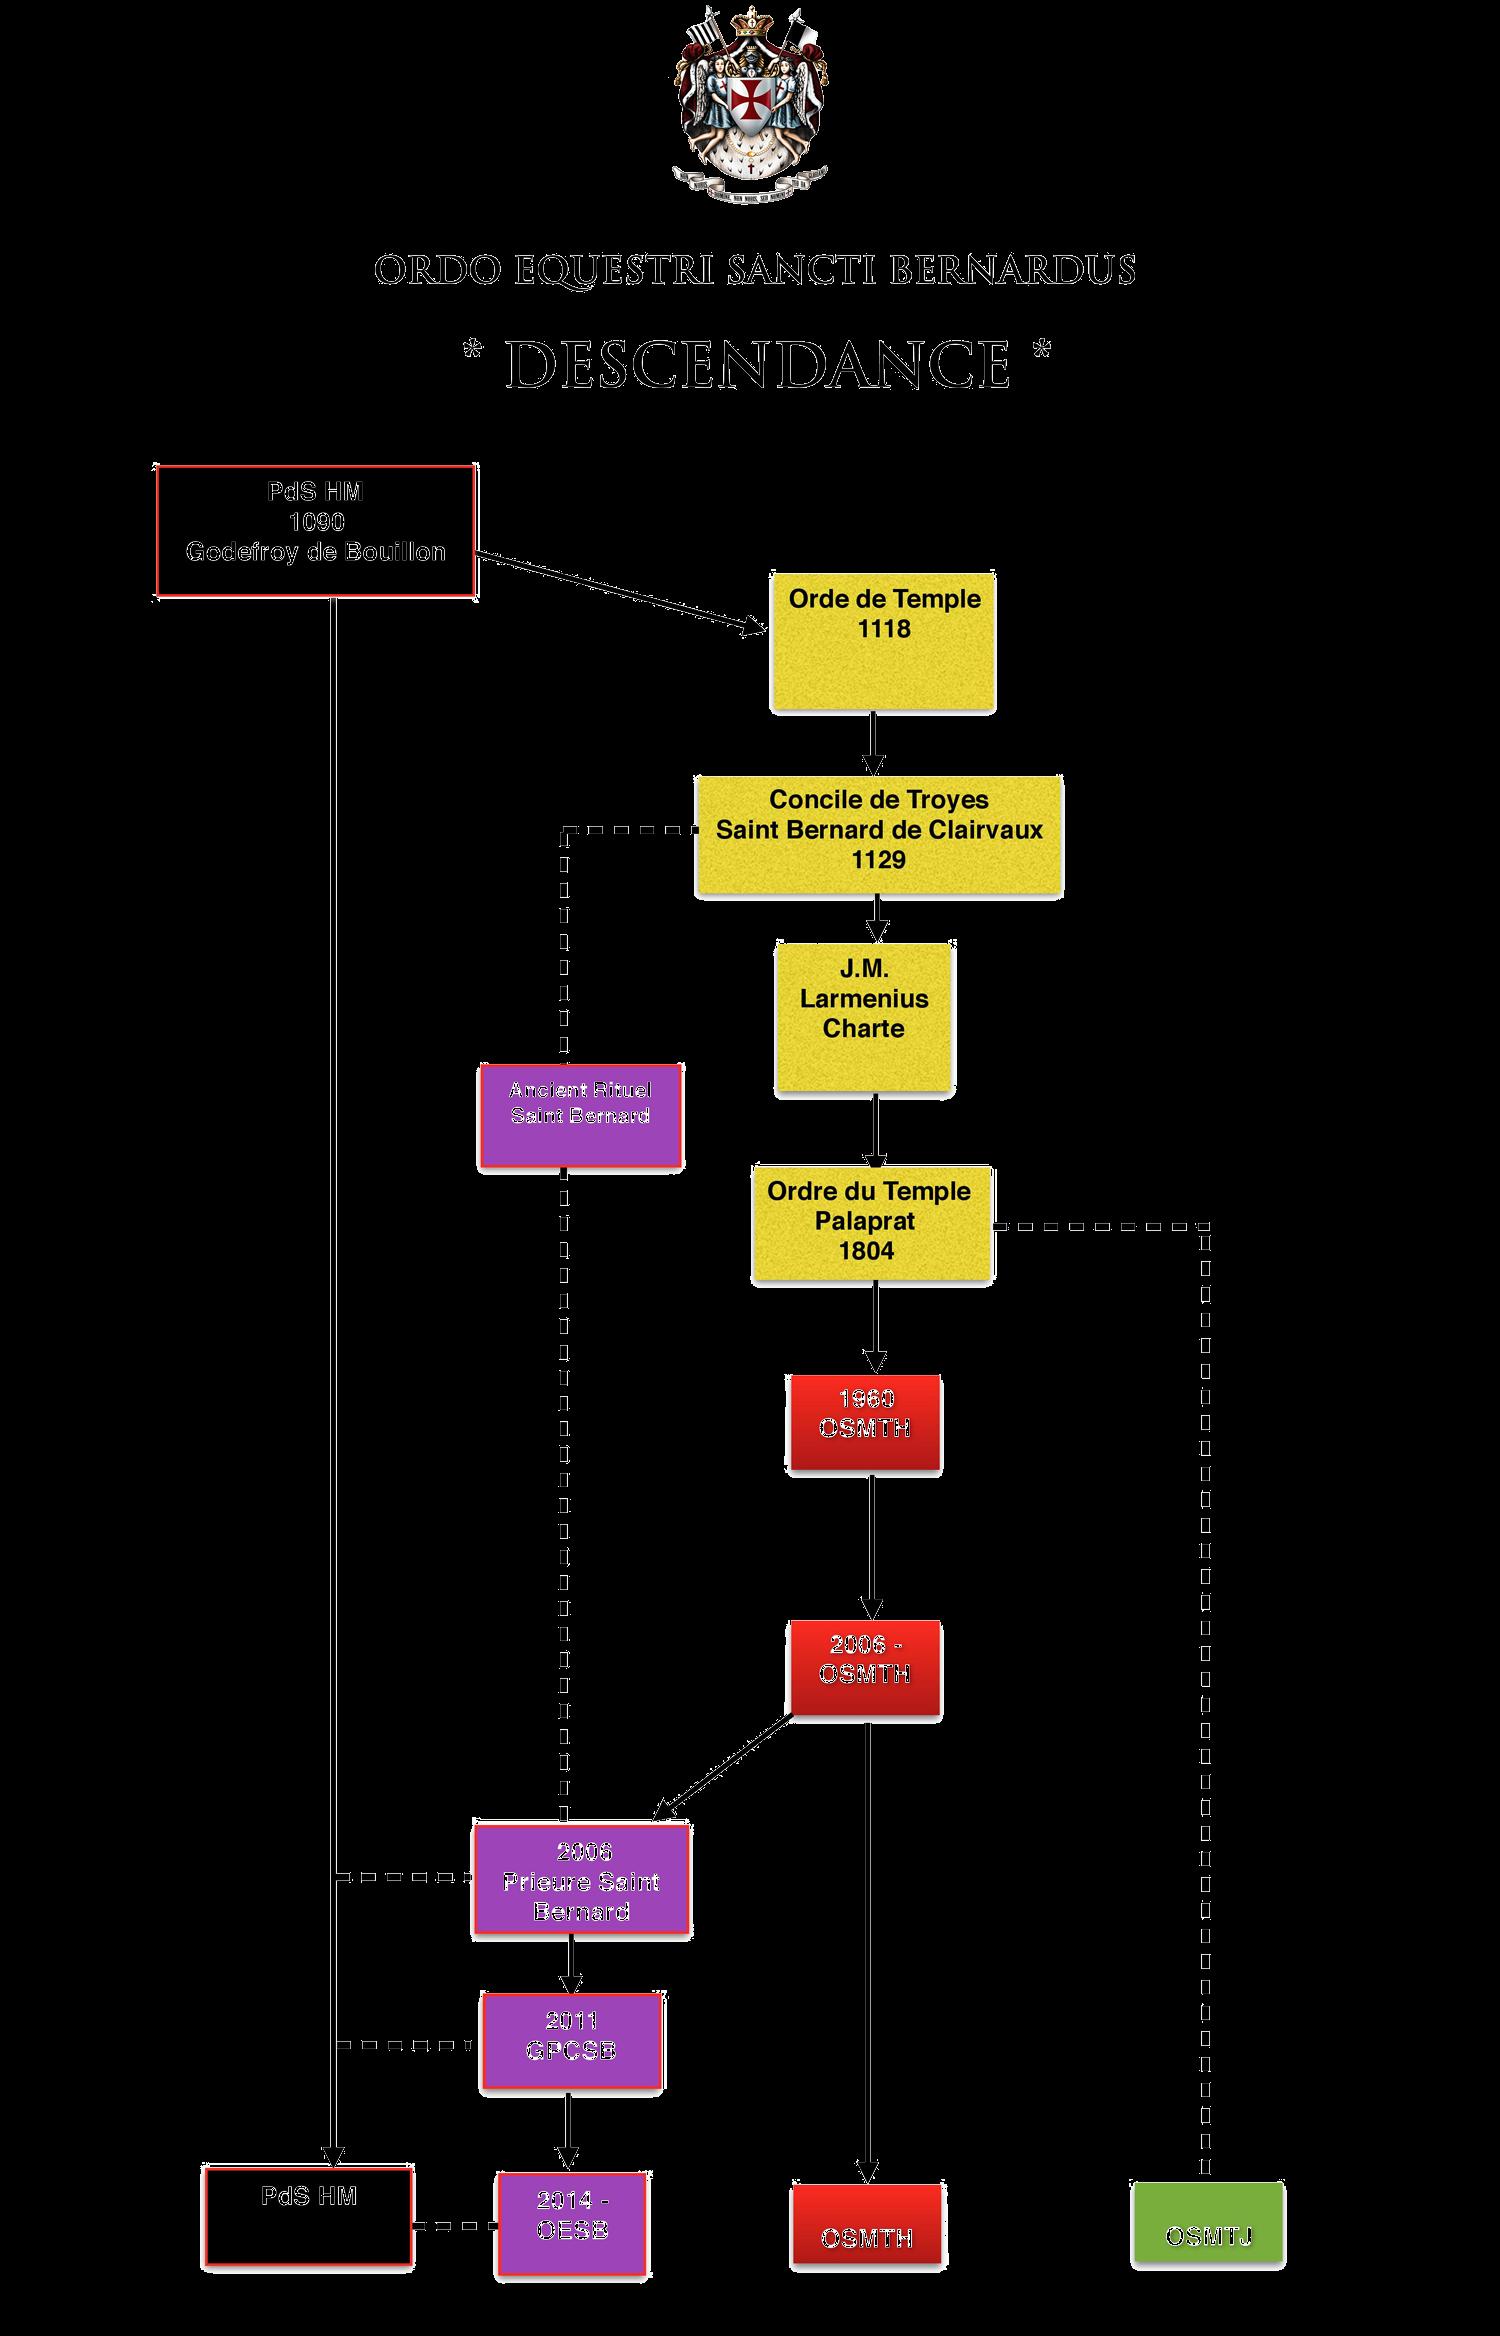 structura-oesb-page-001-mic